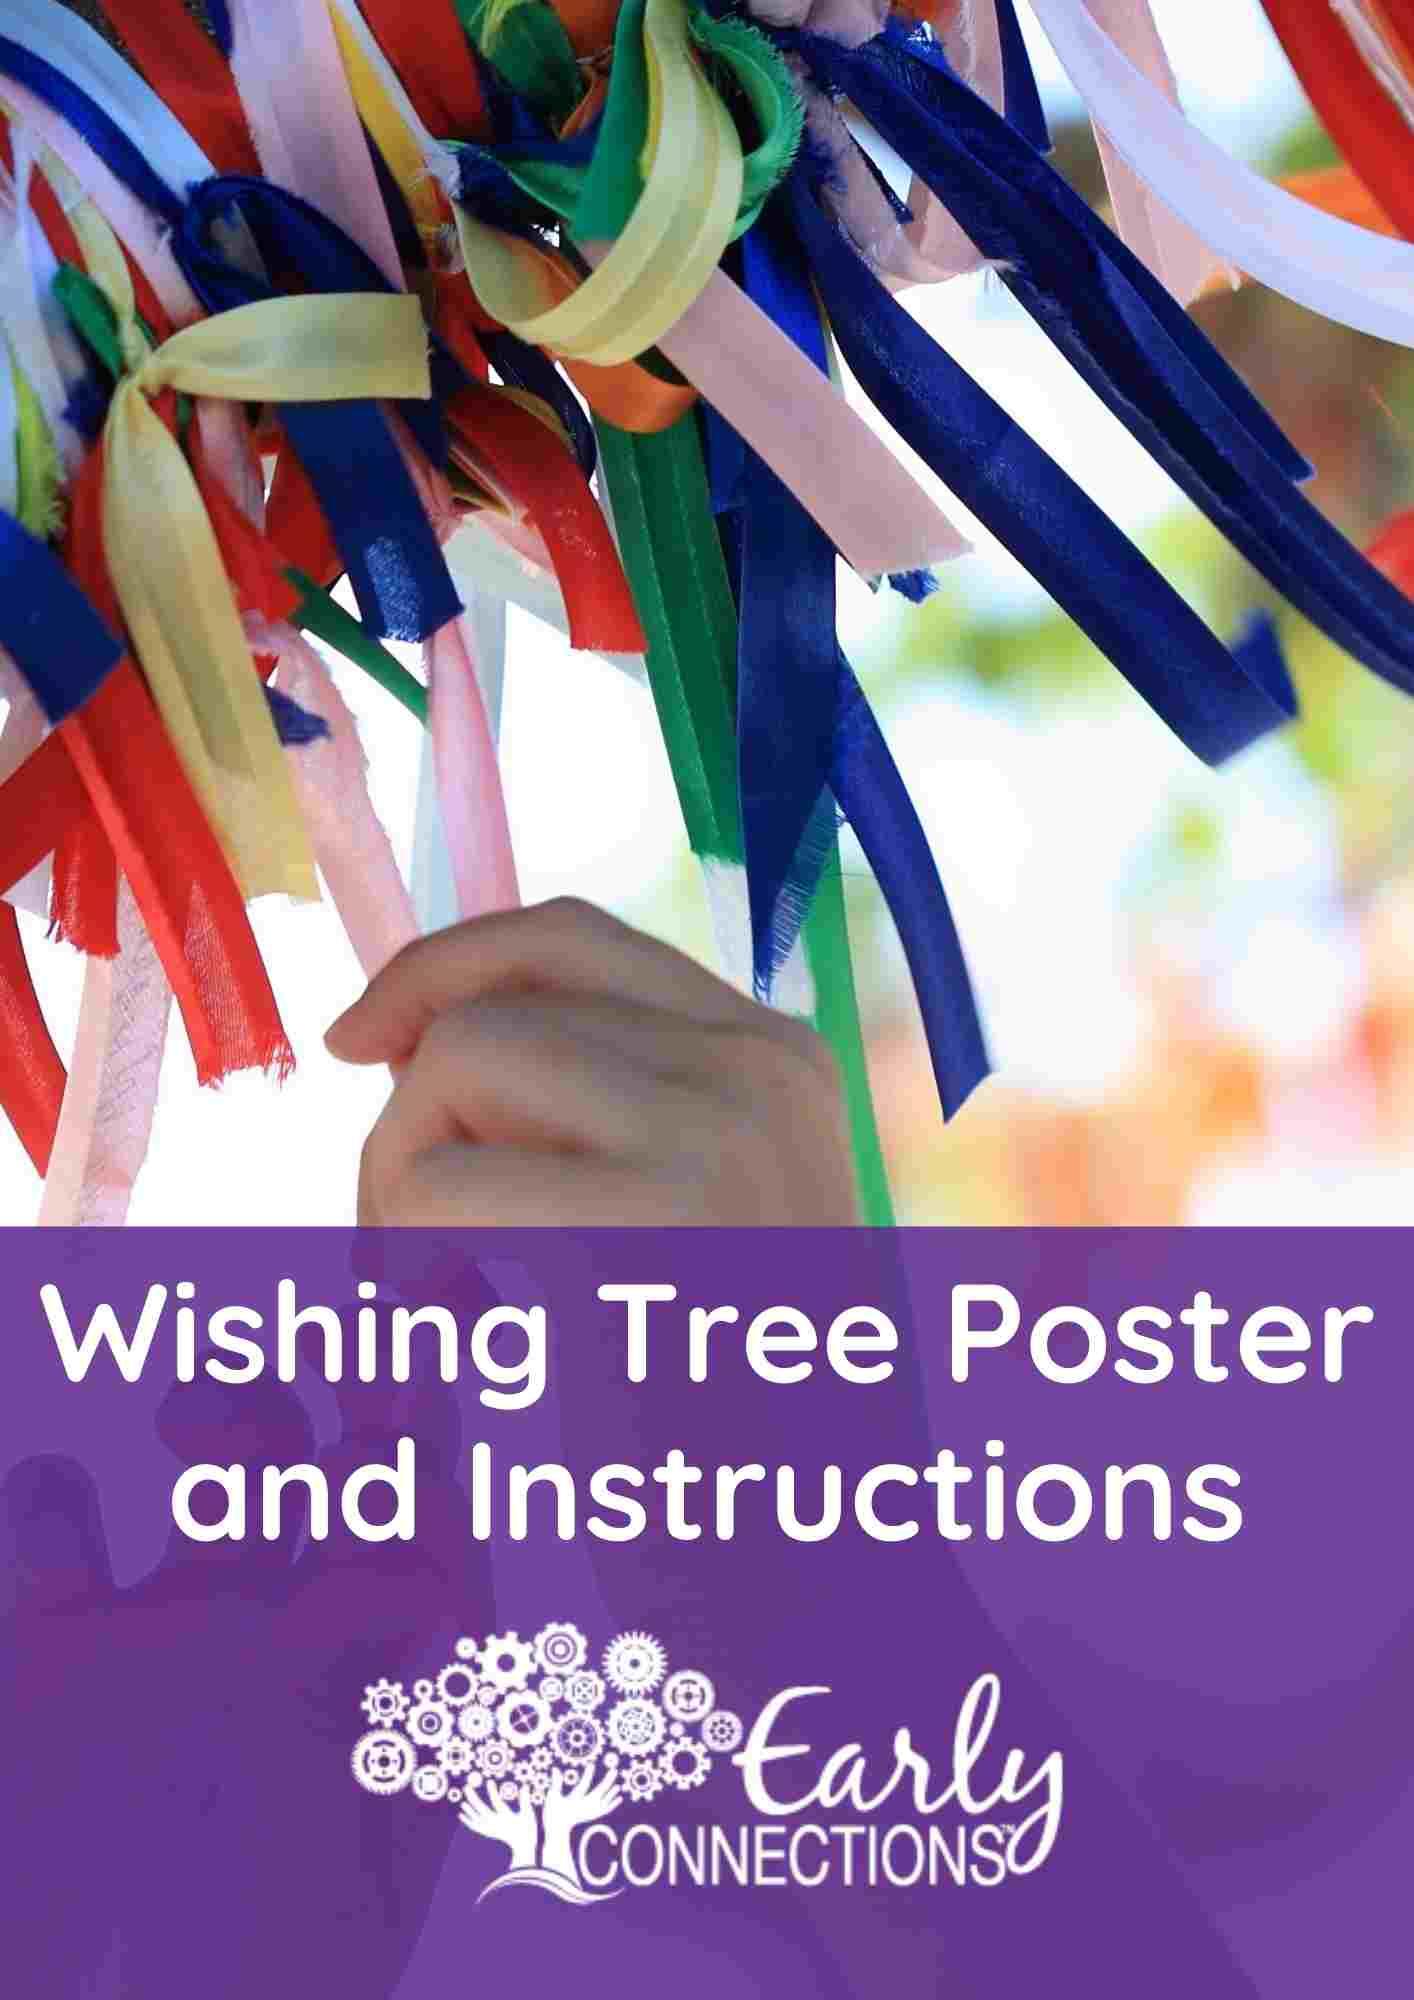 Wishing Tree Project